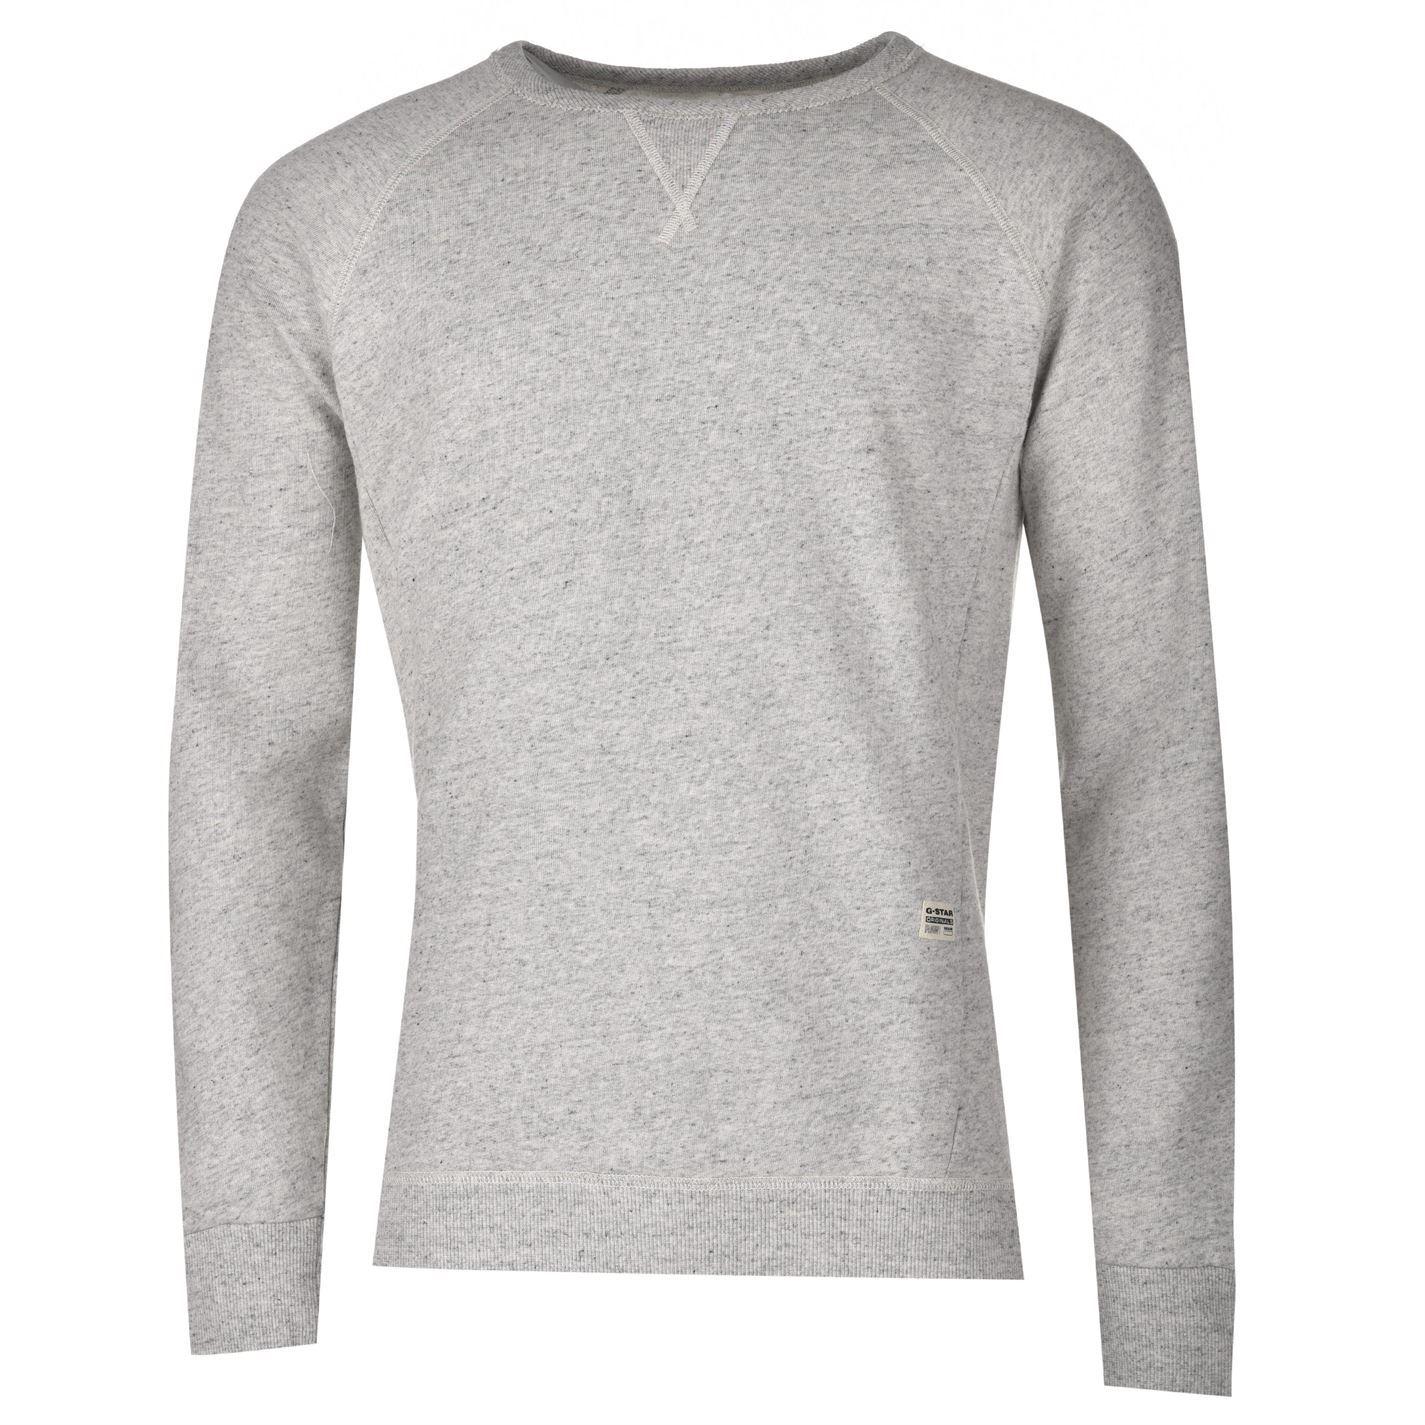 G-Star-Mens-Limbar-Sweat-Top-Long-Sleeve-Round-Neck-Casual-Sweatshirt